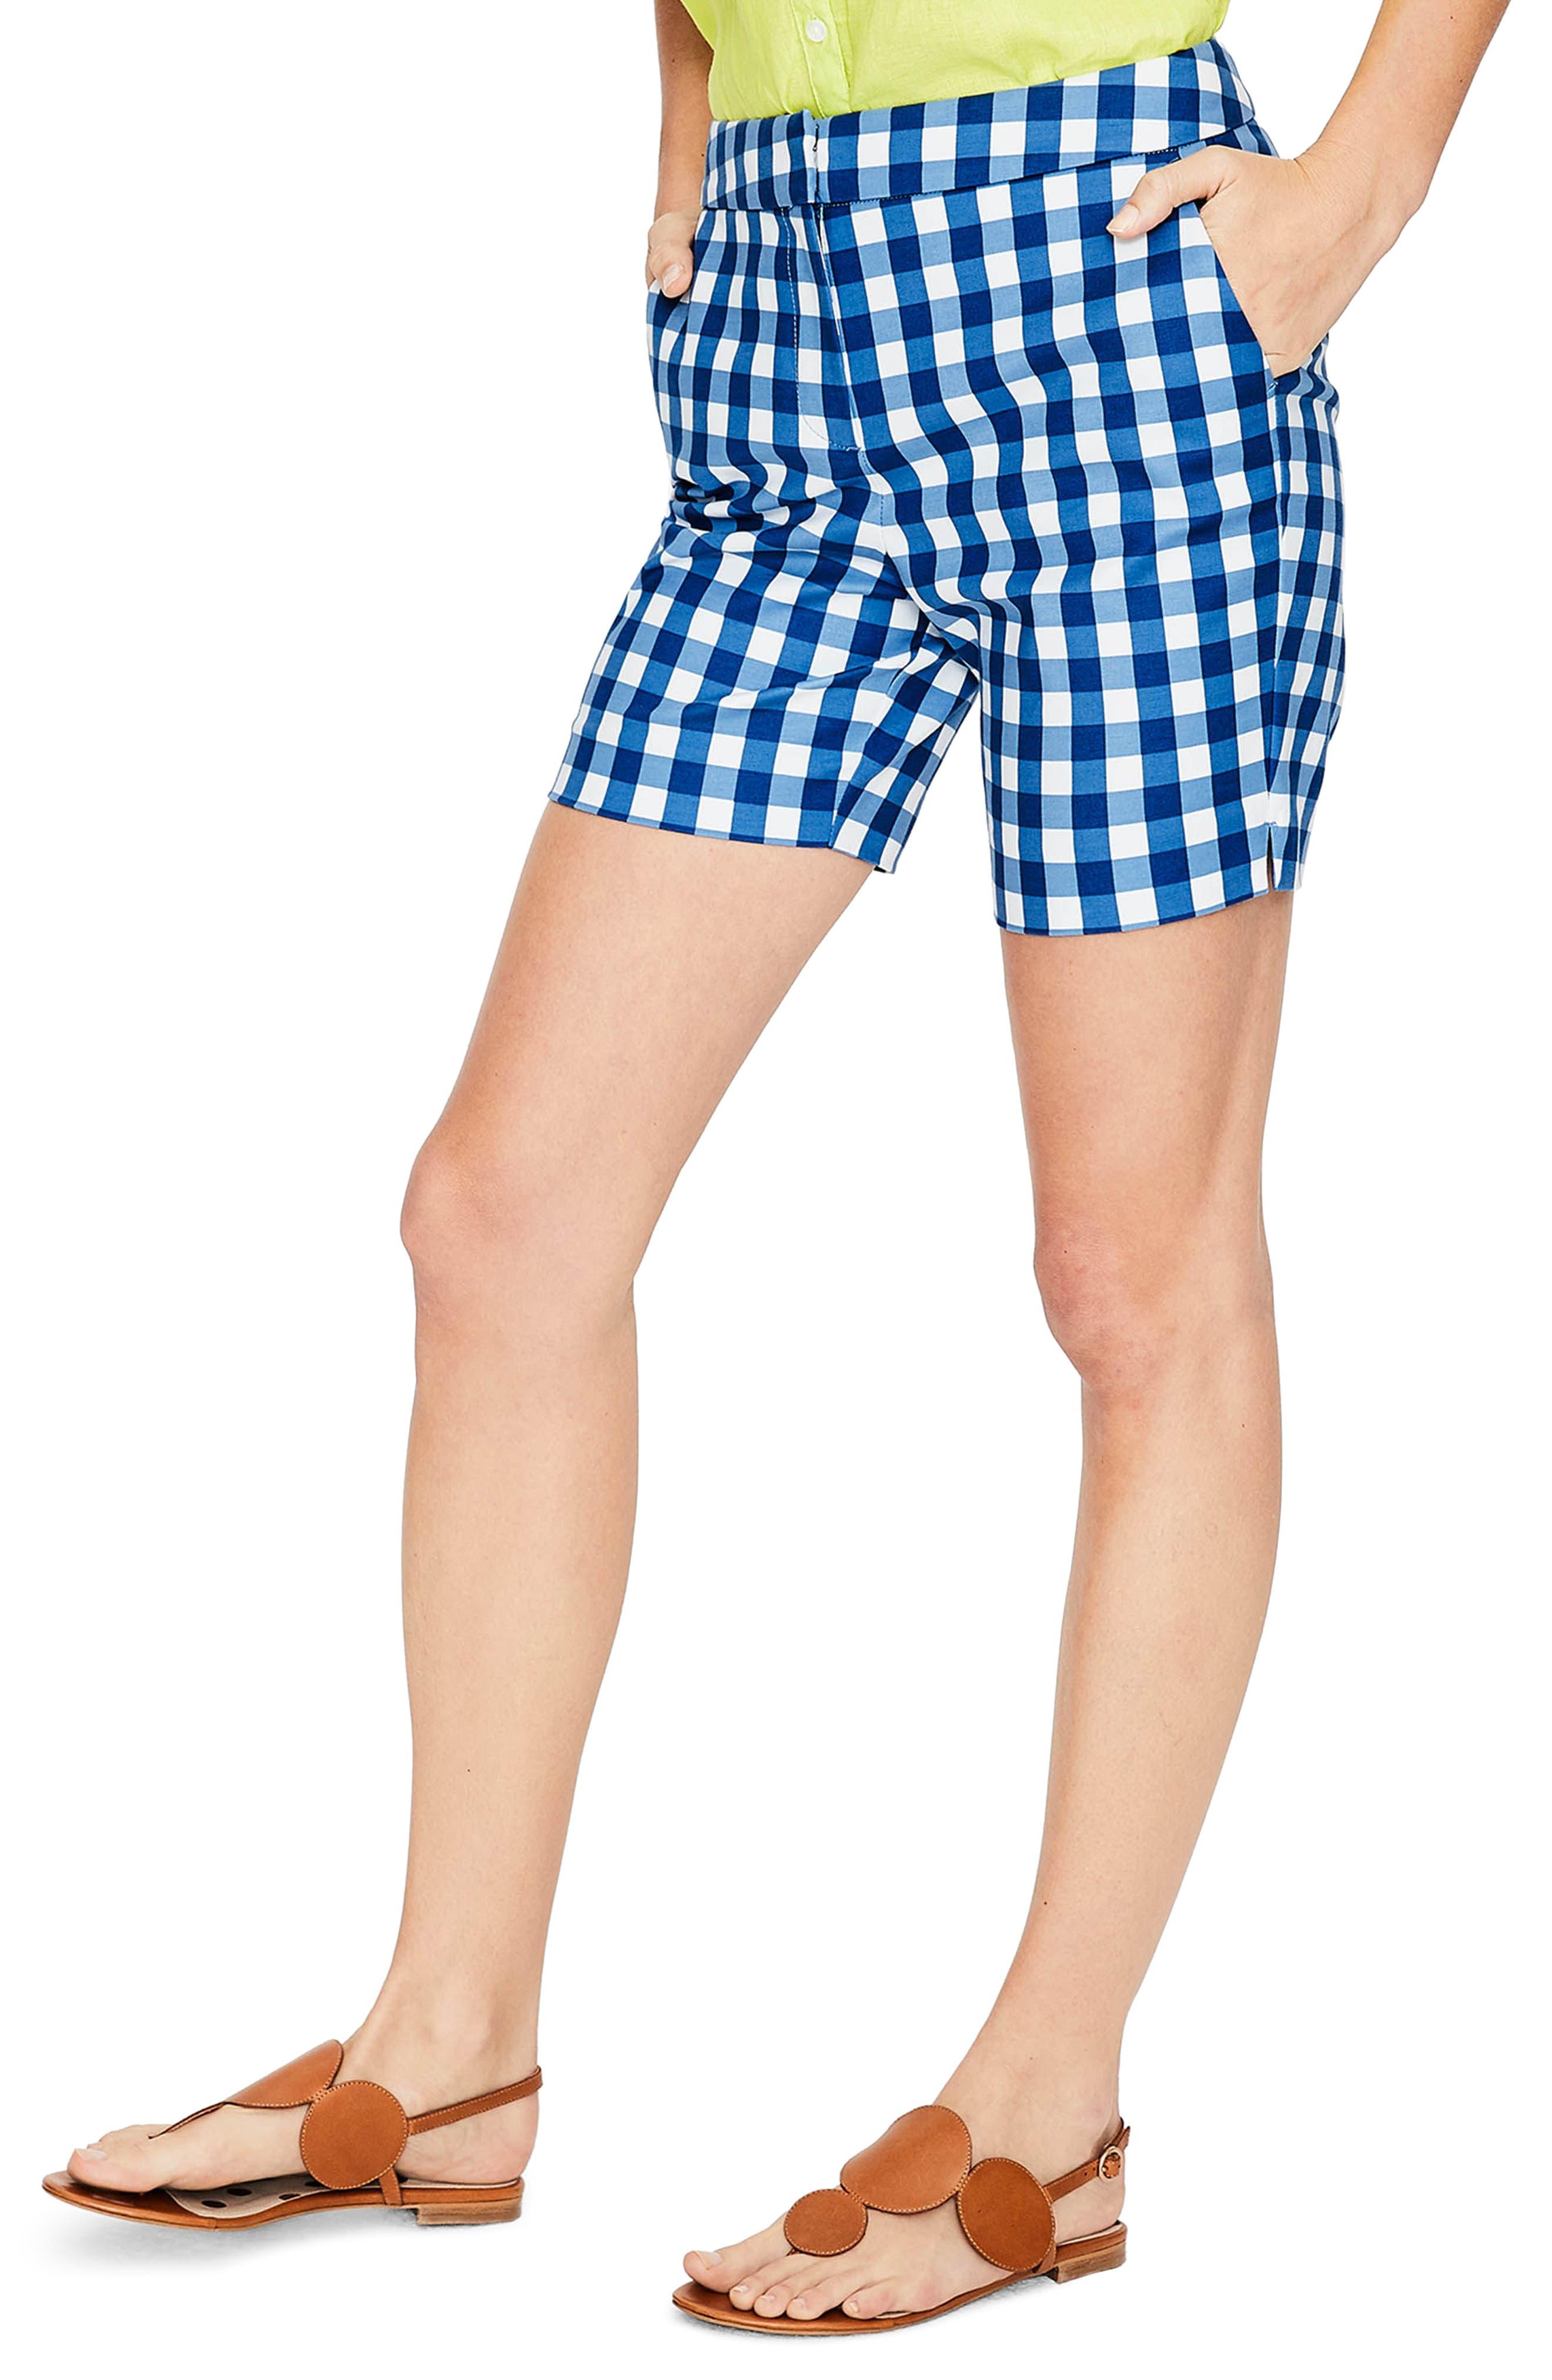 Richmond Check Shorts,                         Main,                         color, Riviera Blue Gingham